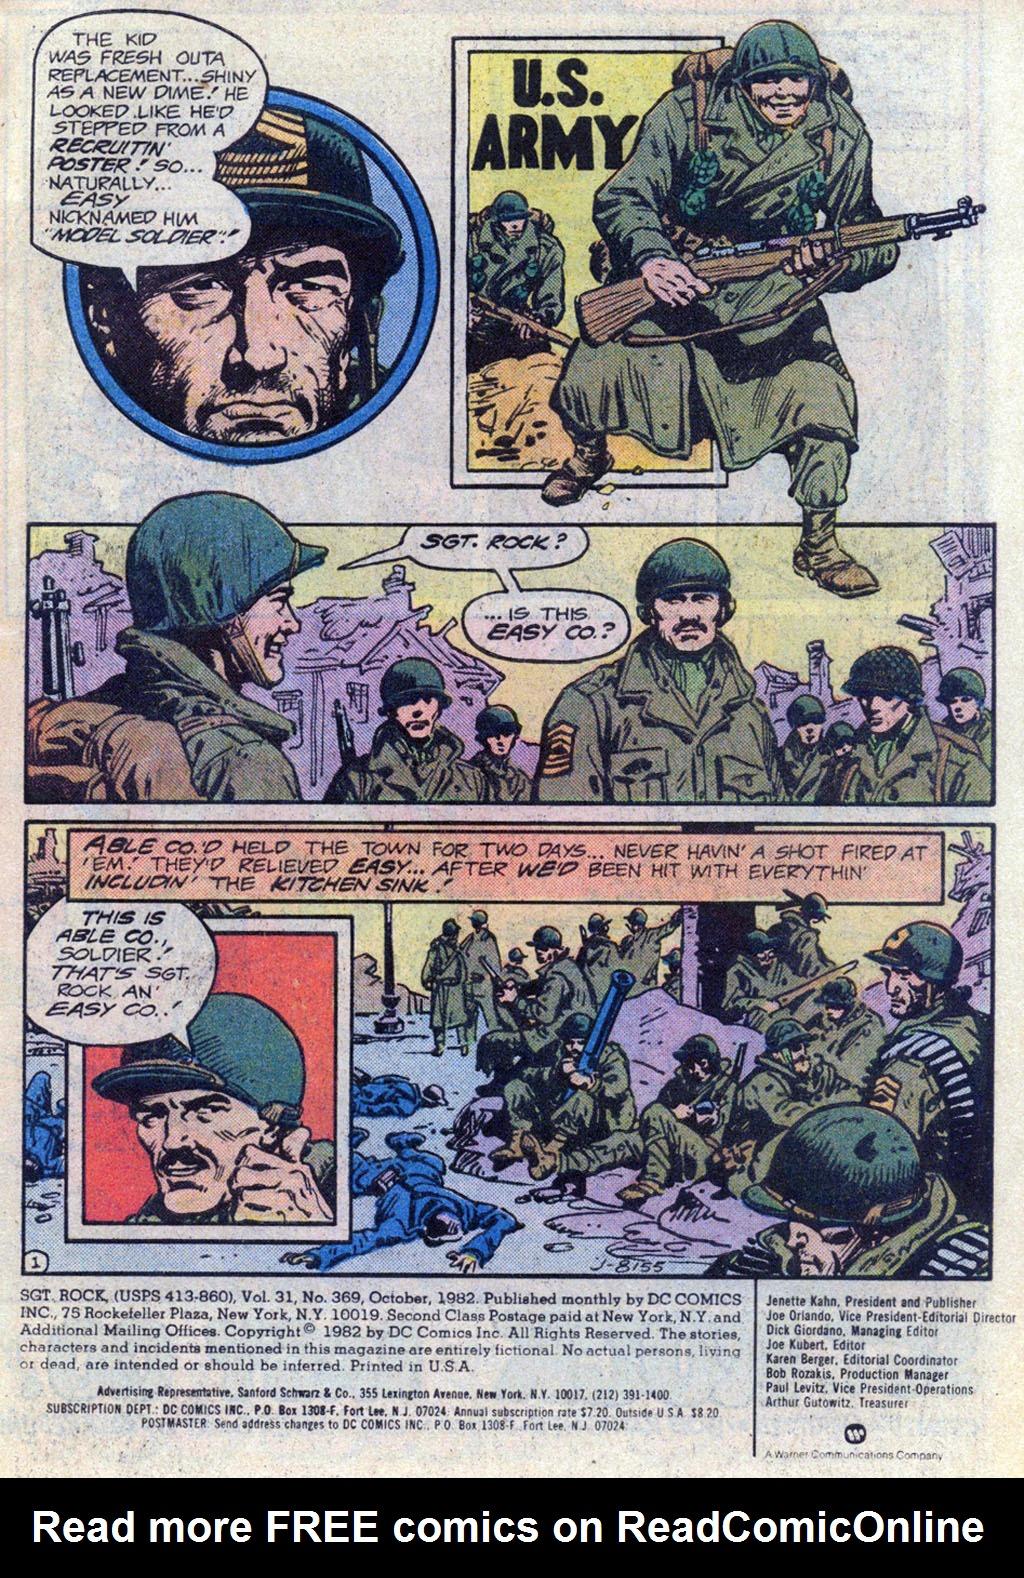 Read online Sgt. Rock comic -  Issue #369 - 2